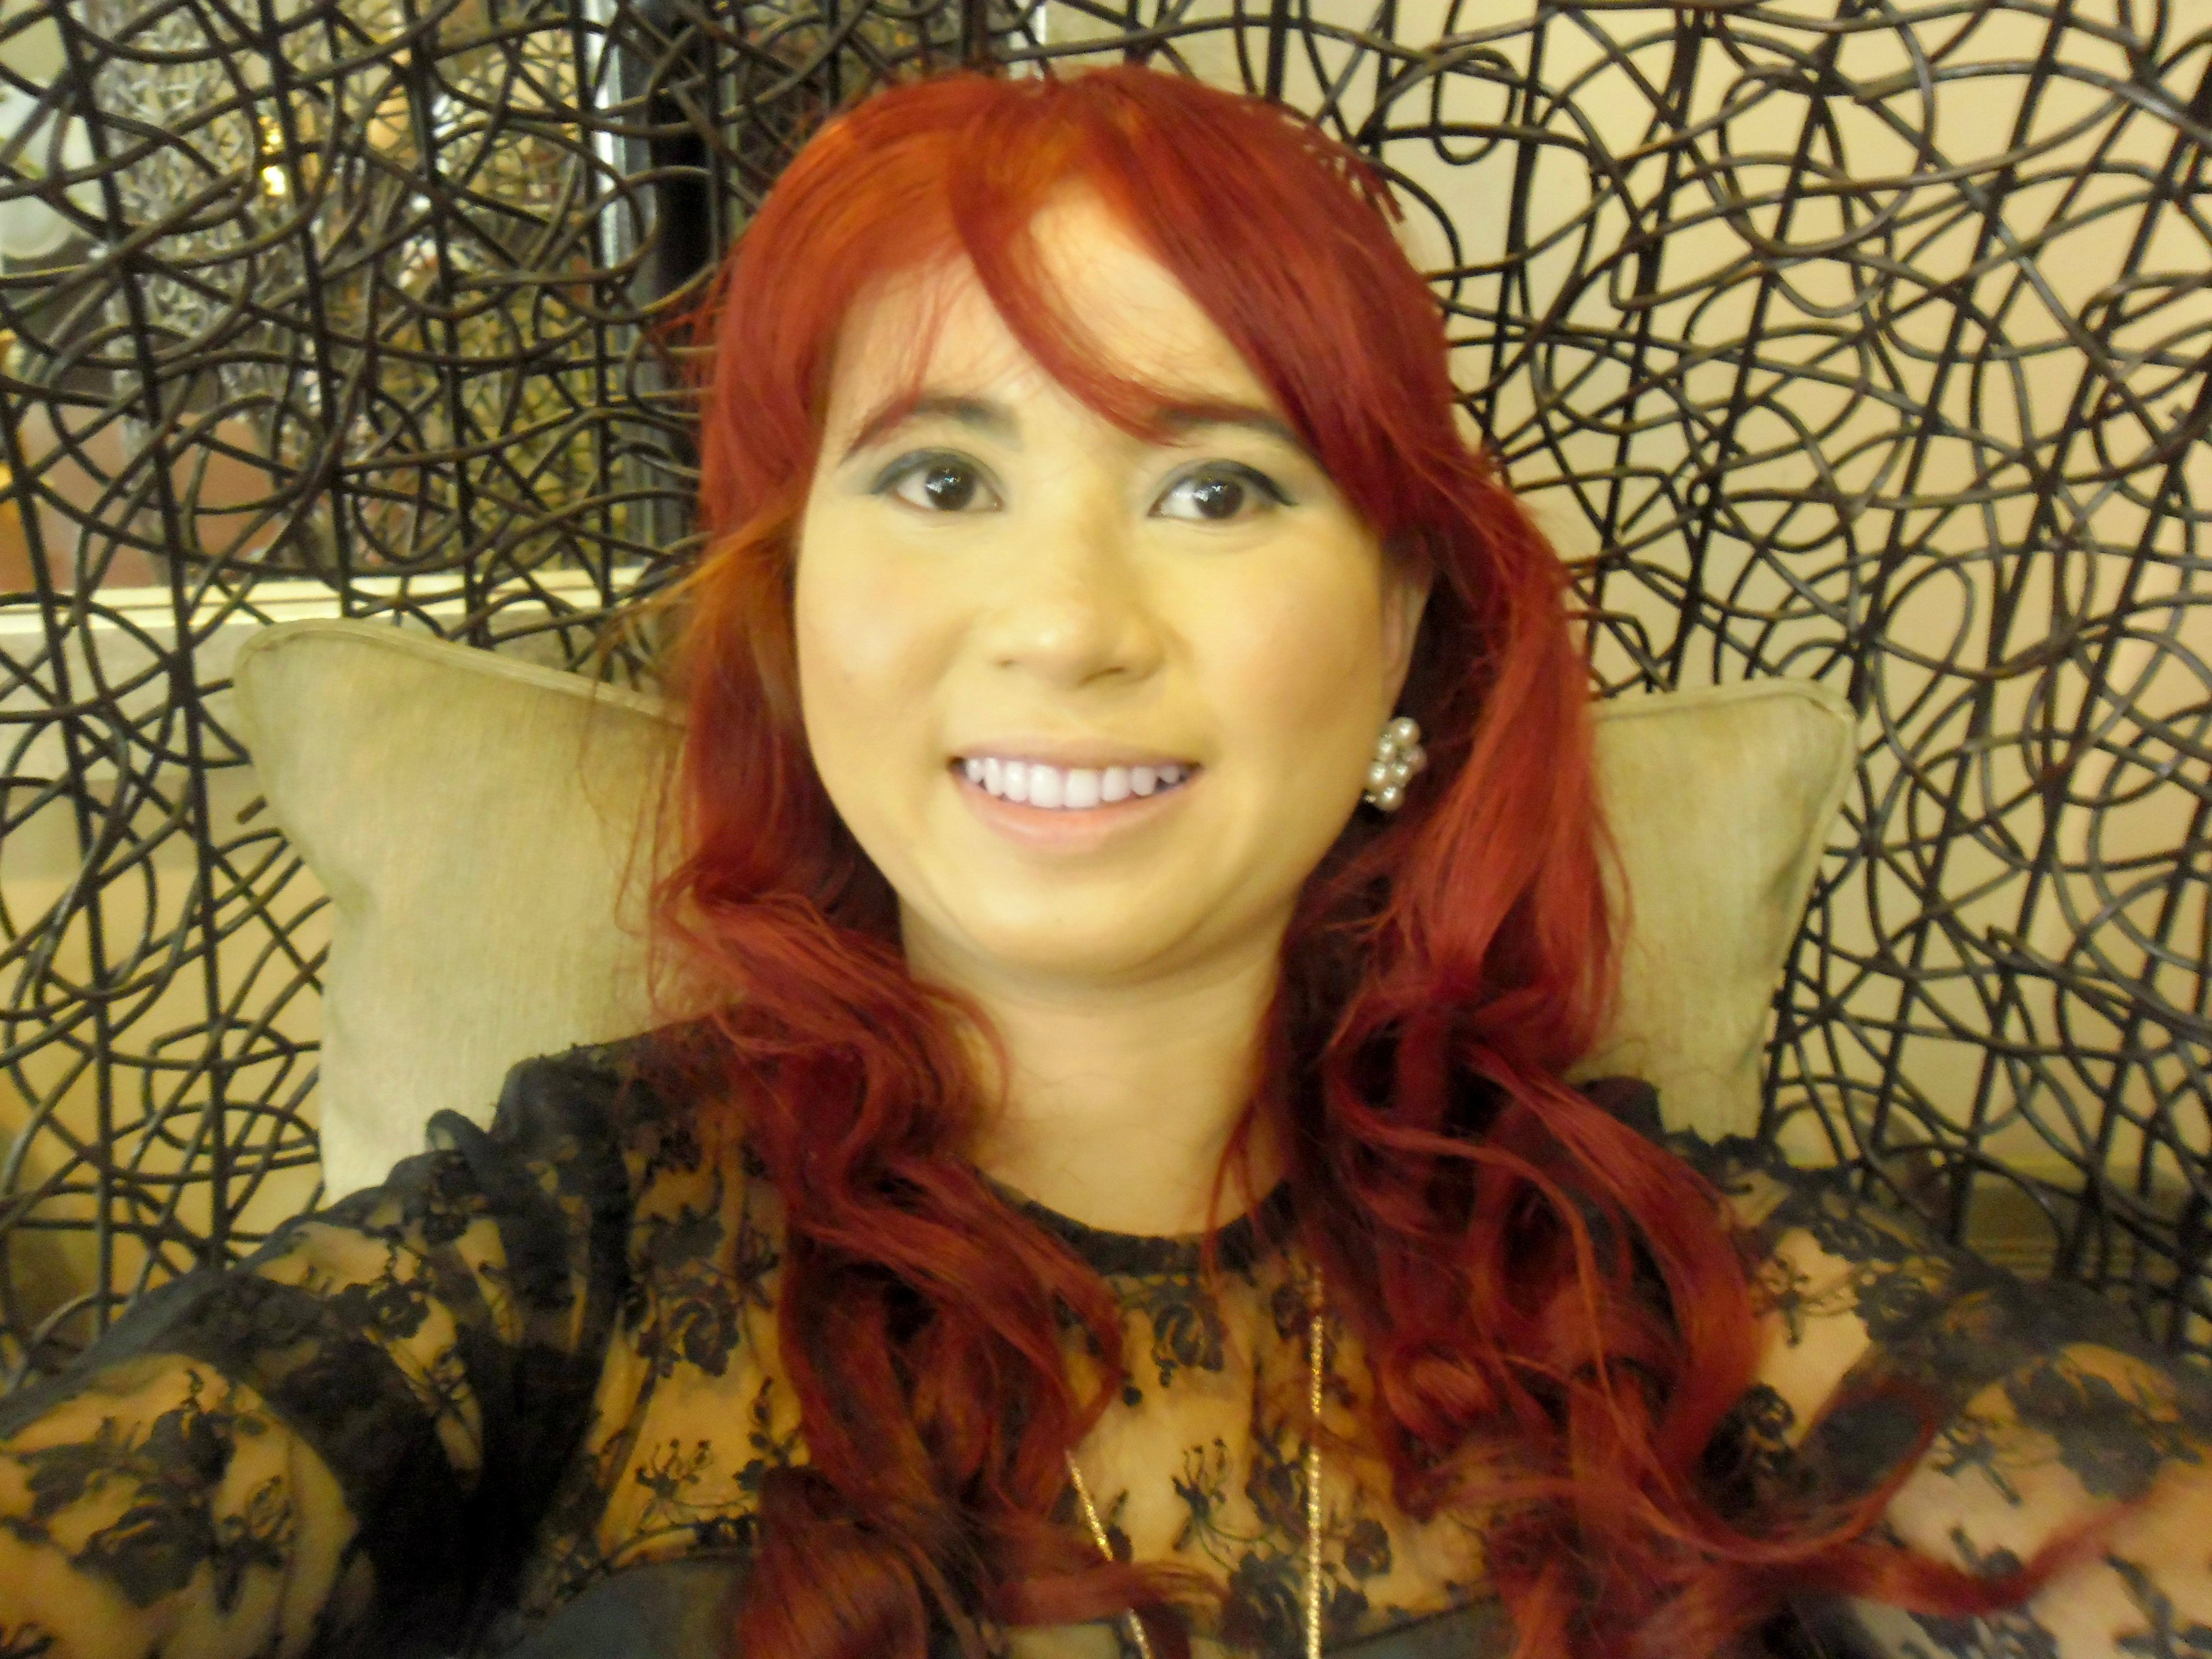 Crimson Obsession Splat Red Hair Dye By Joanna April Lumbad Red Hair Dyed Red Hair Dyed Hair